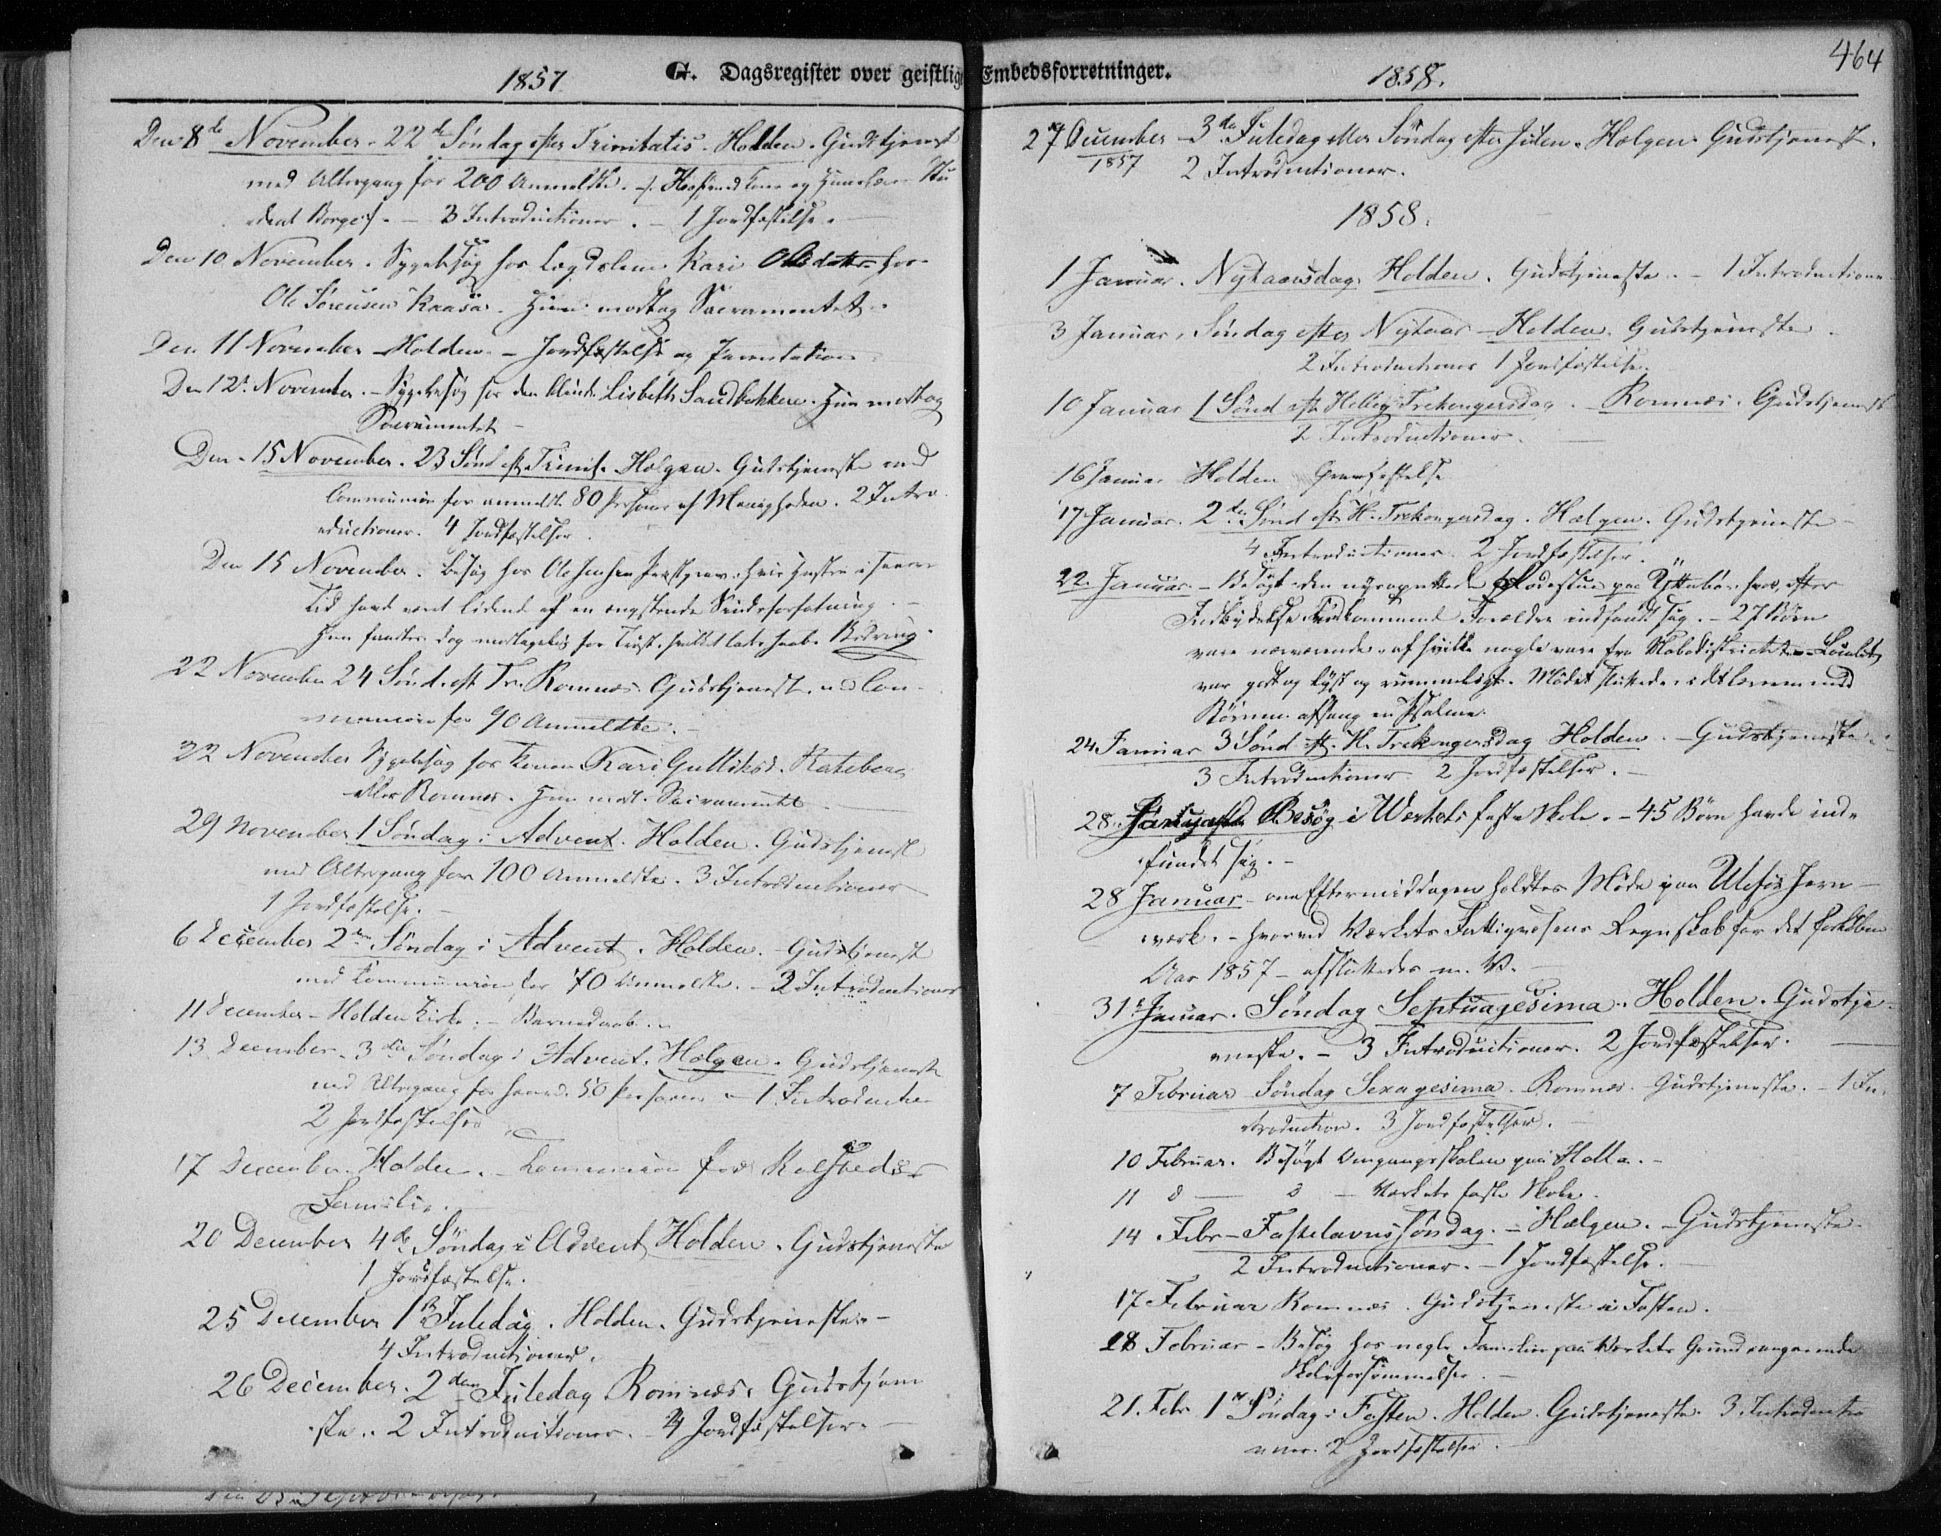 SAKO, Holla kirkebøker, F/Fa/L0005: Ministerialbok nr. 5, 1849-1860, s. 464